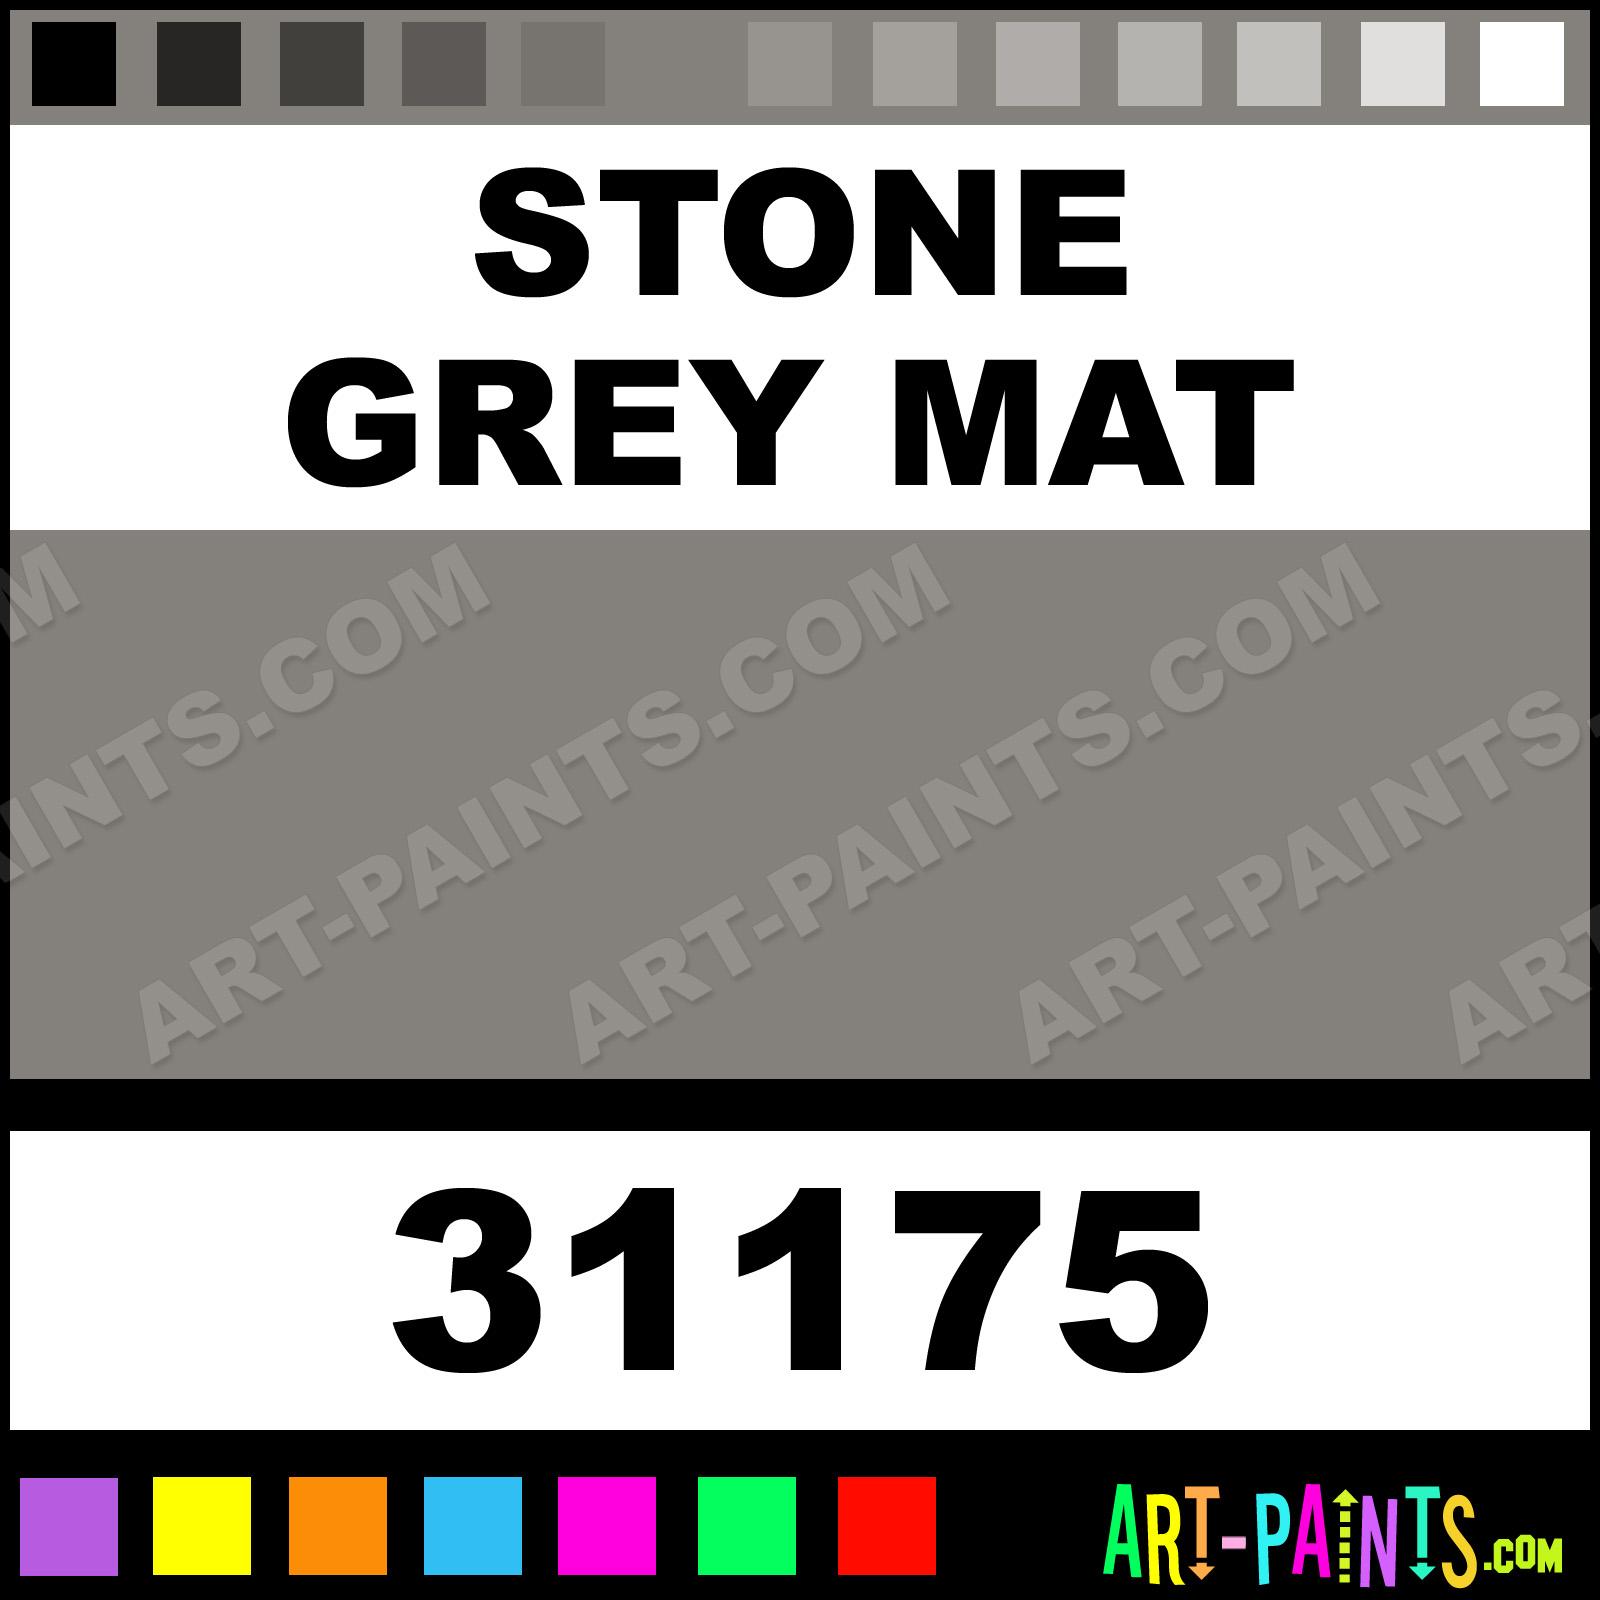 Revell paint colors numberedtype stone grey mat artist airbrush spray paints 31175 nvjuhfo Choice Image